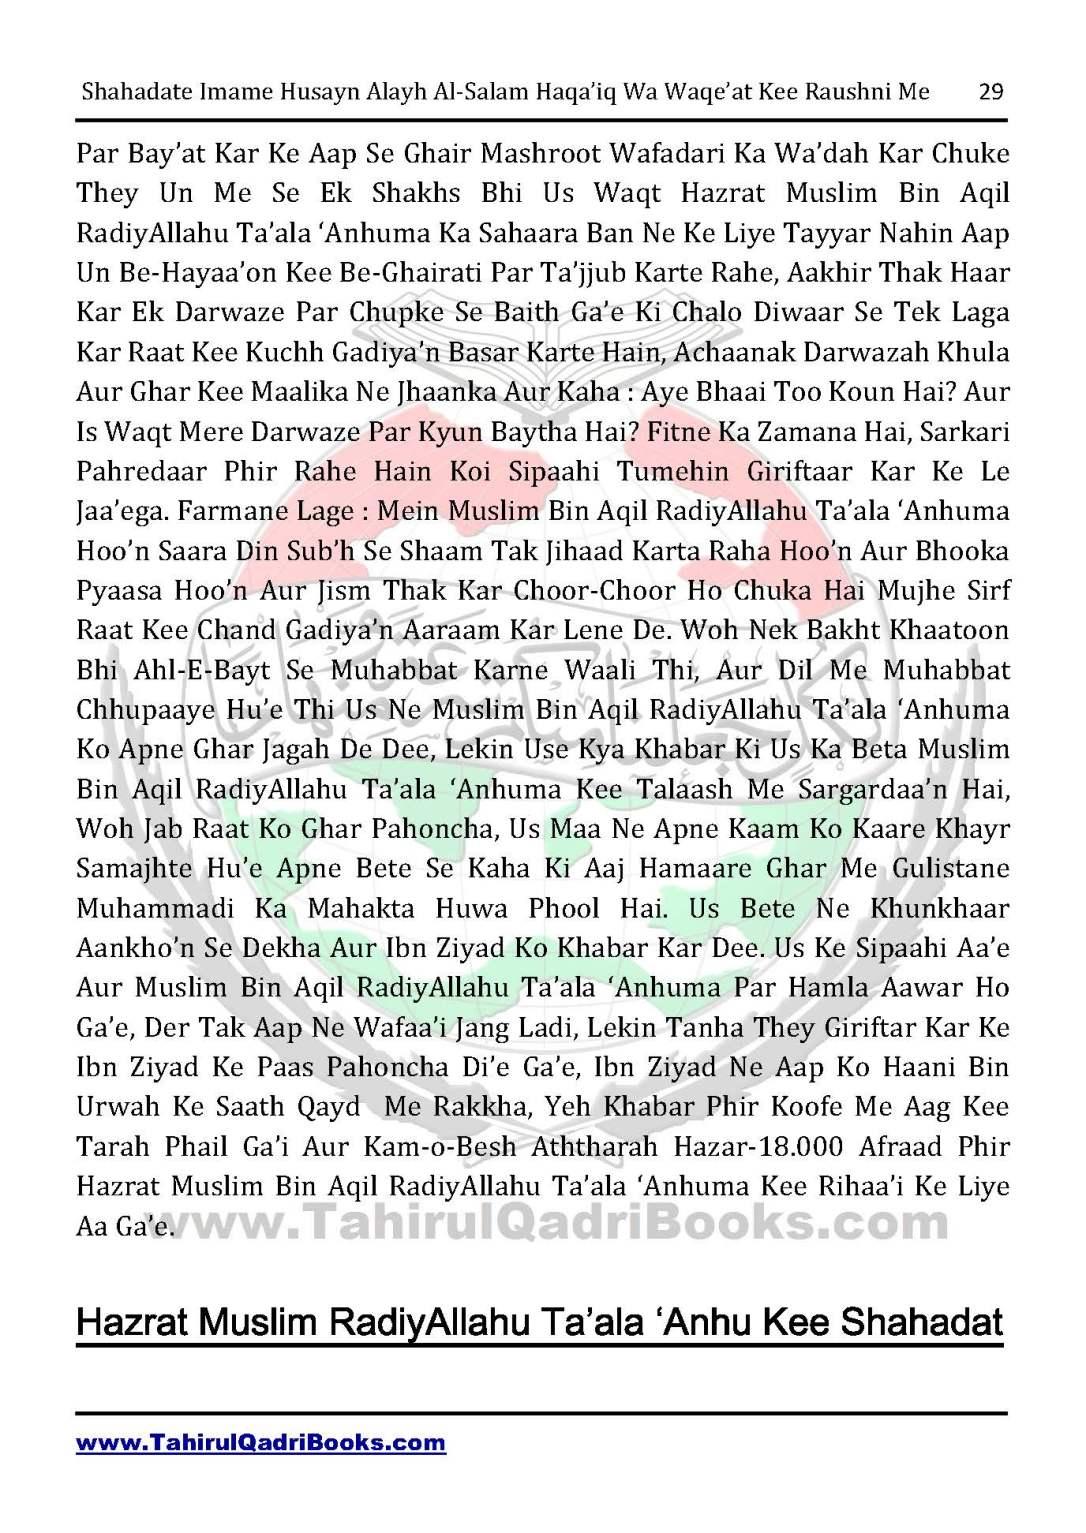 shahadate-imame-husayn-alayh-is-salam-haqaiq-wa-waqe_at-kee-raushni-me-in-roman-urdu-unlocked_Page_29